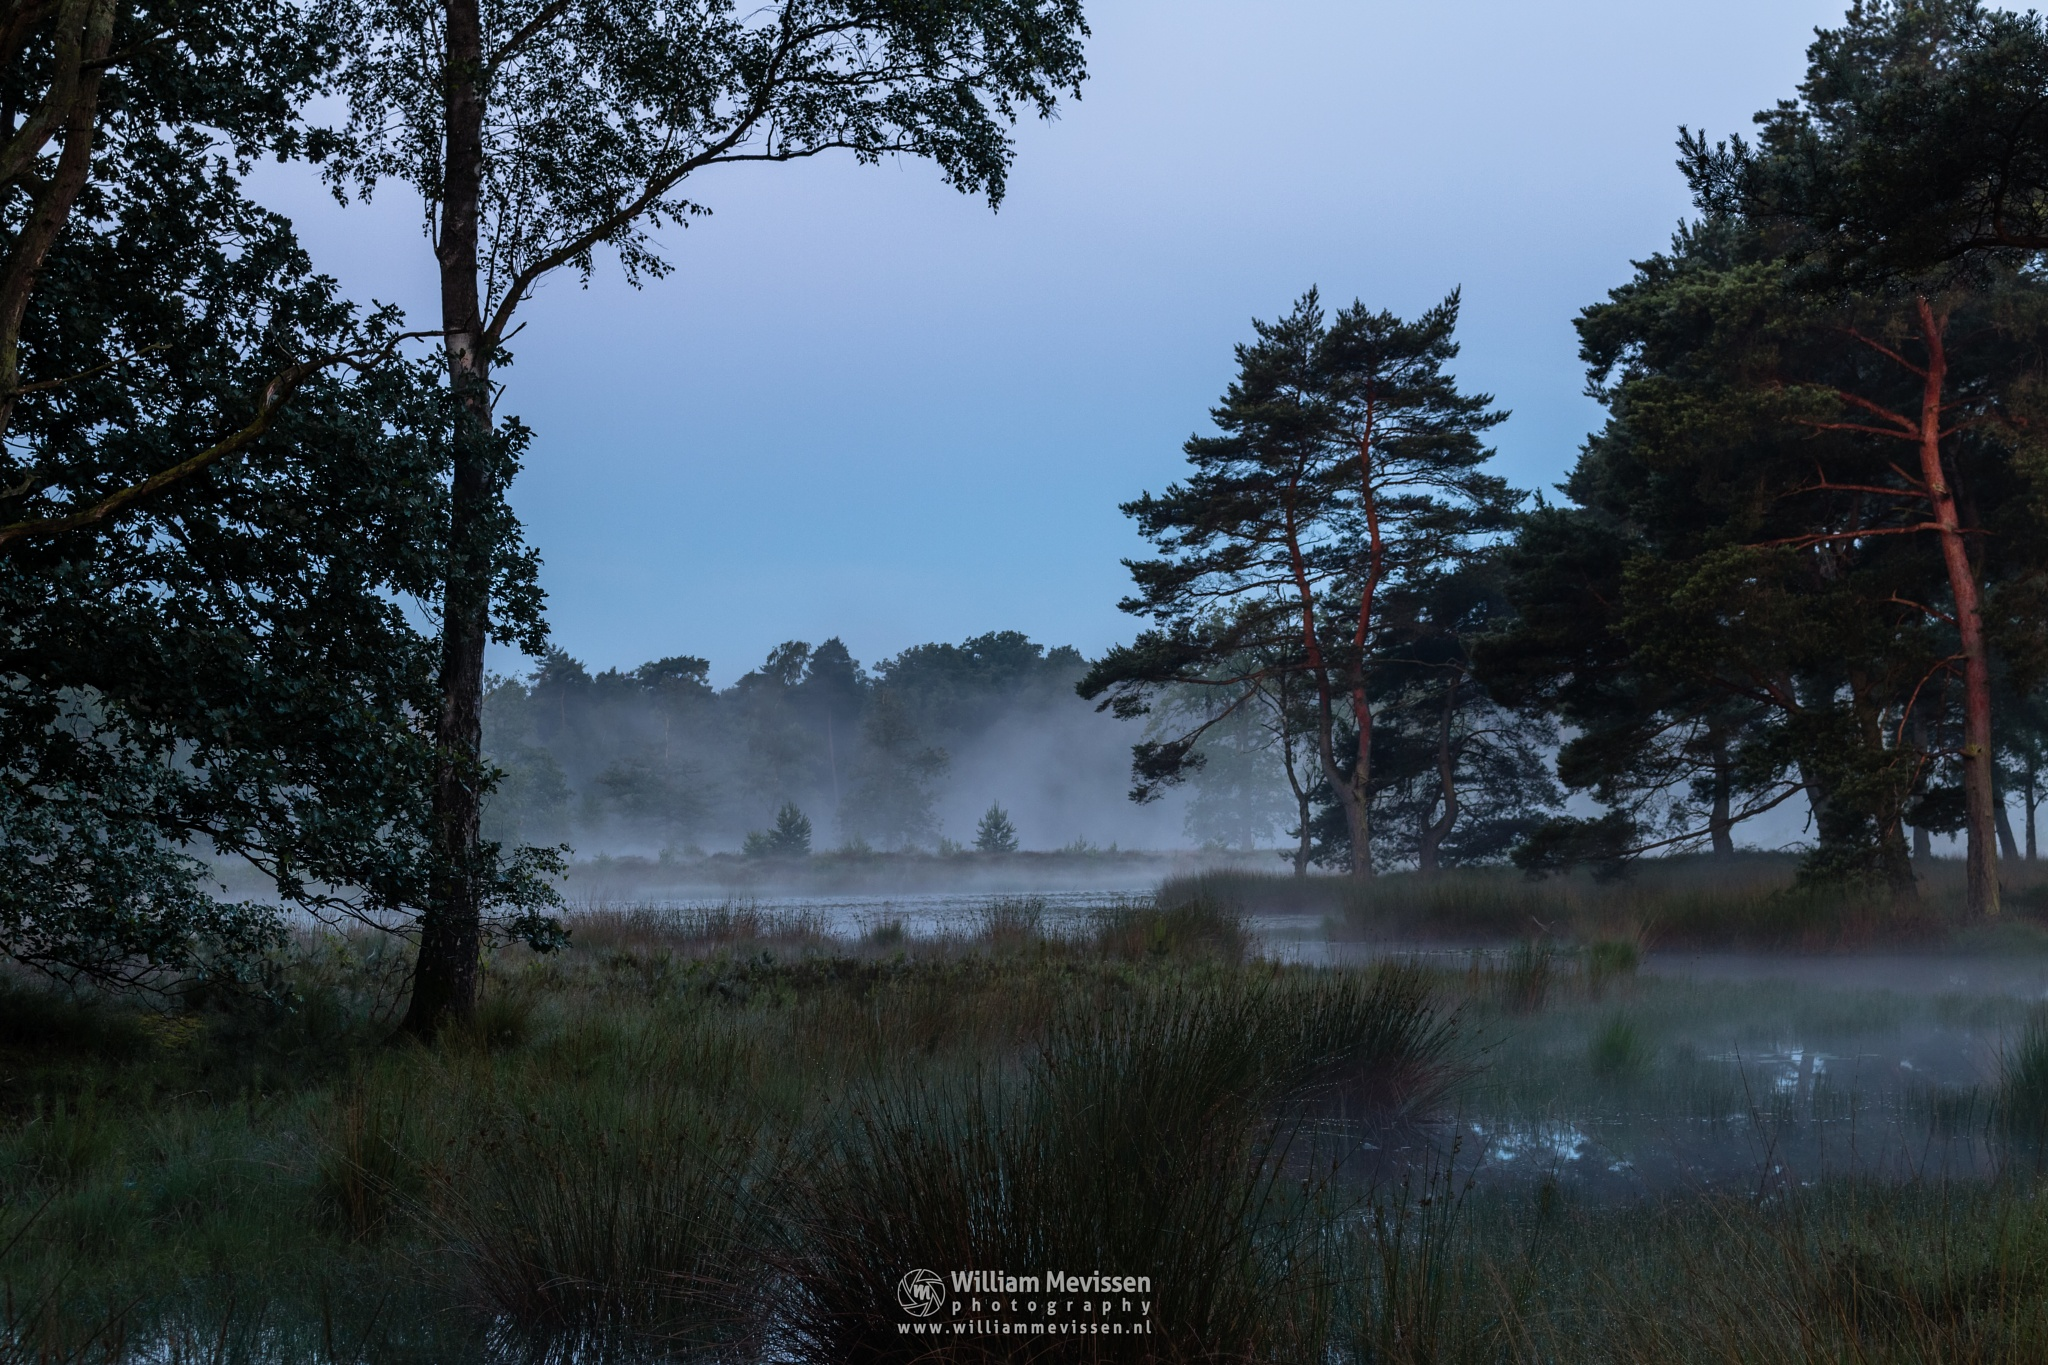 Misty Morning Ravenvennen by William Mevissen